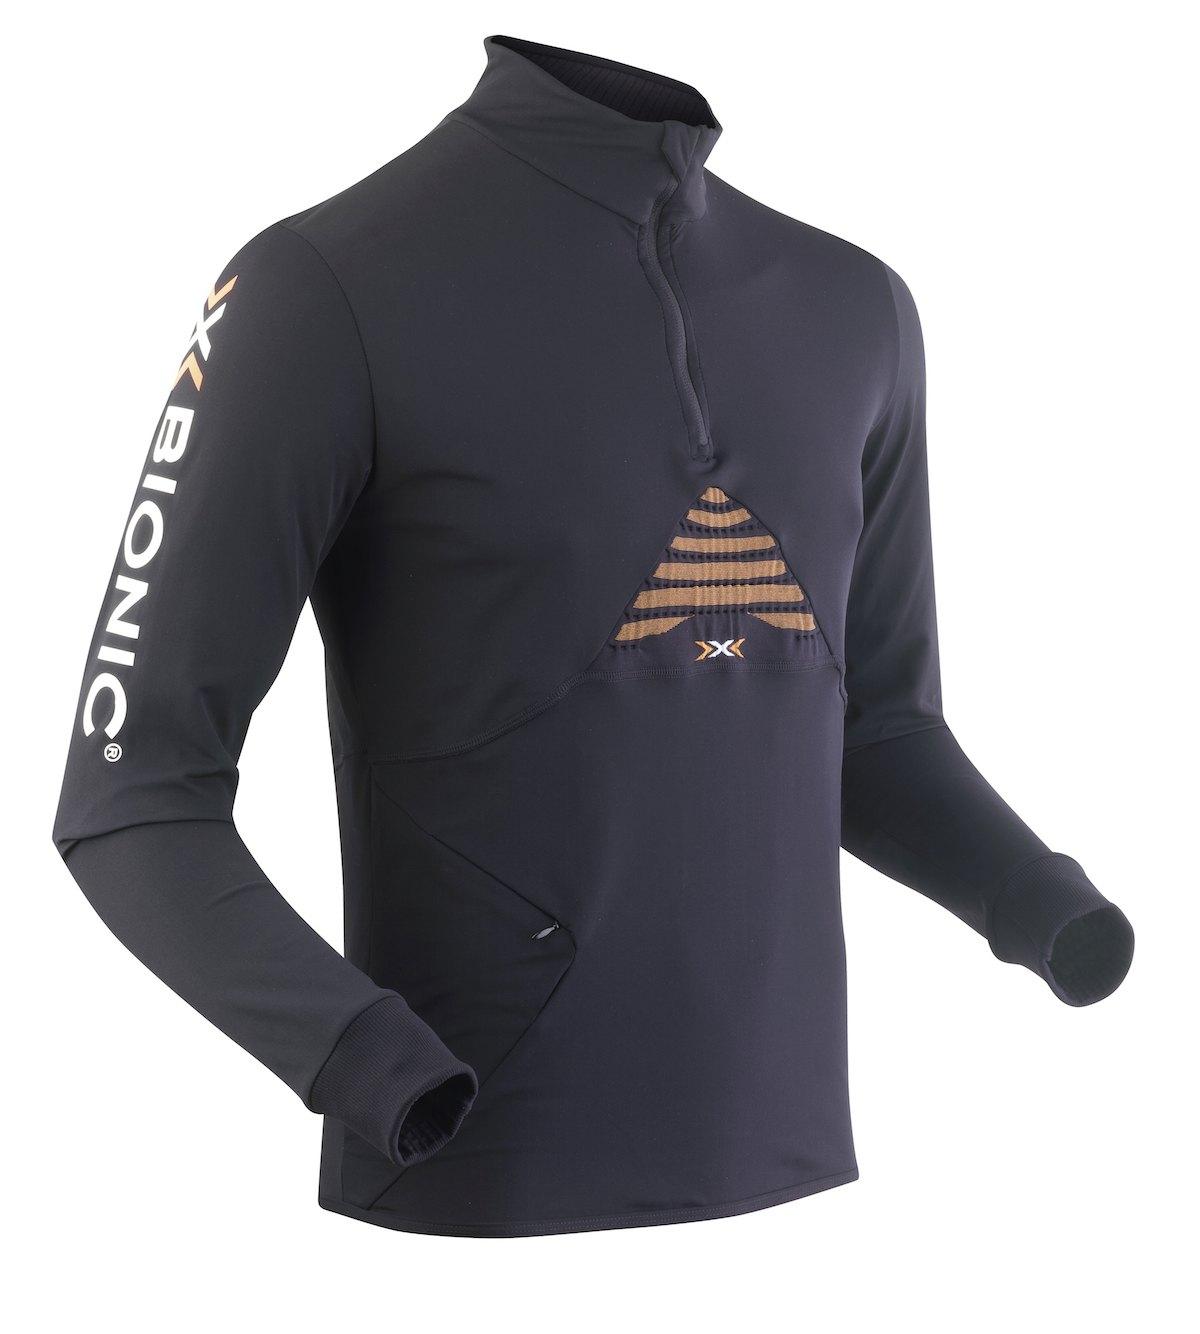 X-Bionic - Trail Running Humdinger manches longues - Base layer - Men's